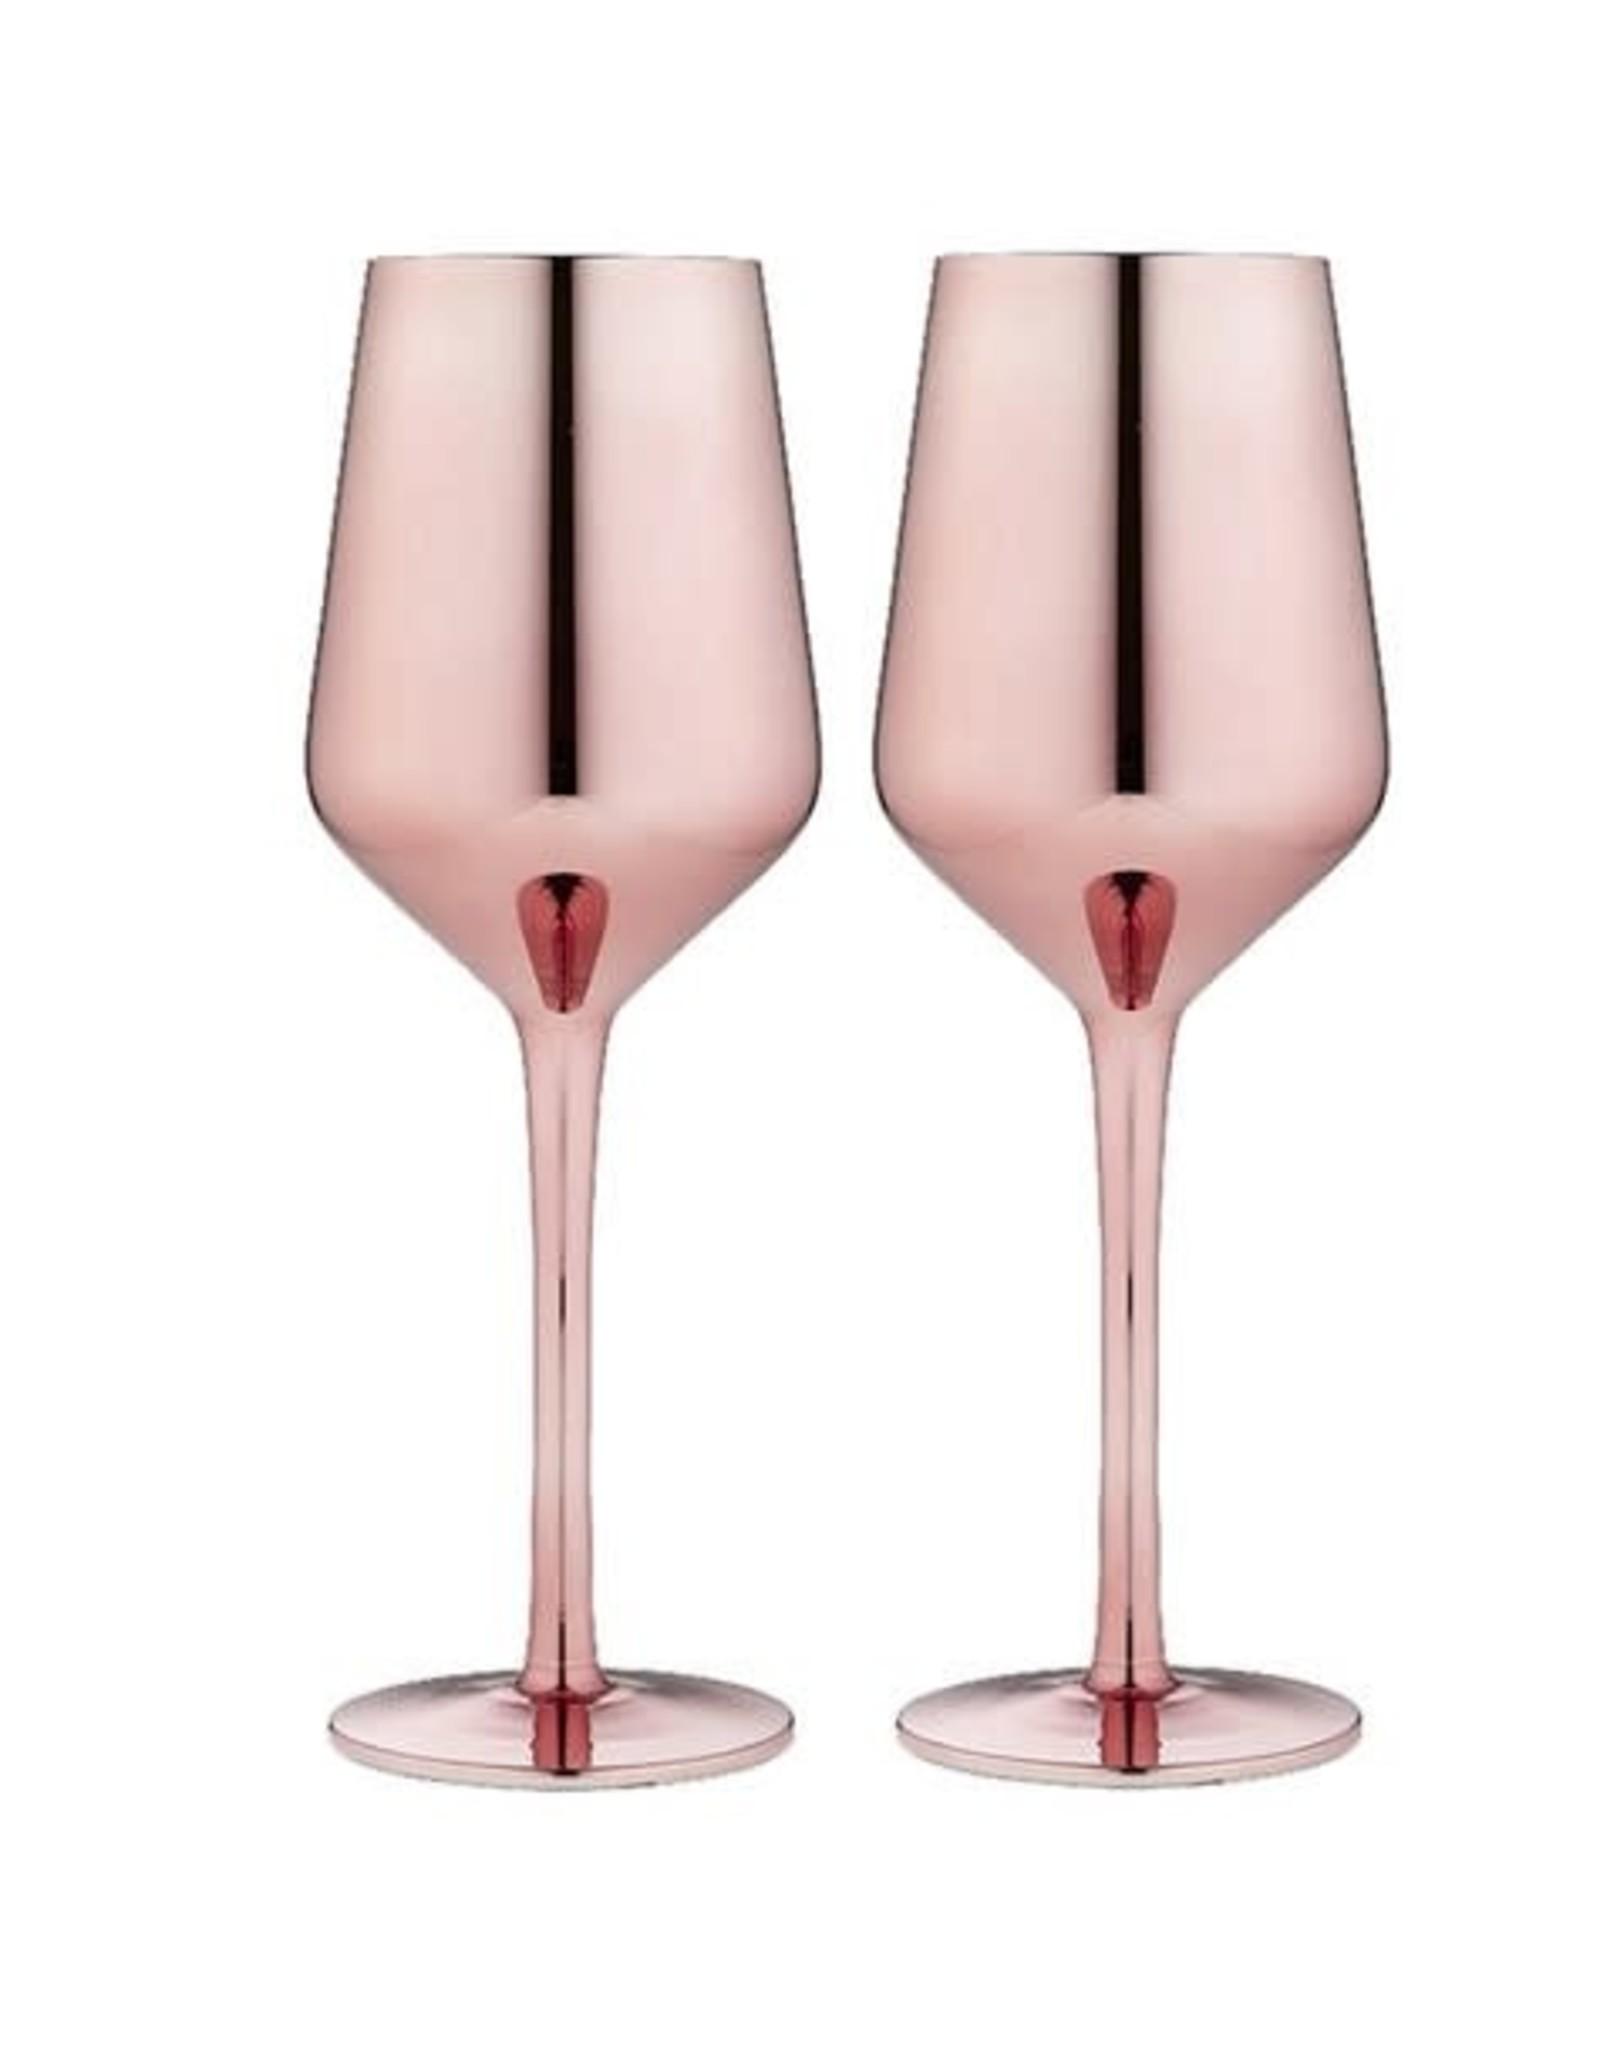 Tempa Tempa Aurora Wine Glasses Set of 2